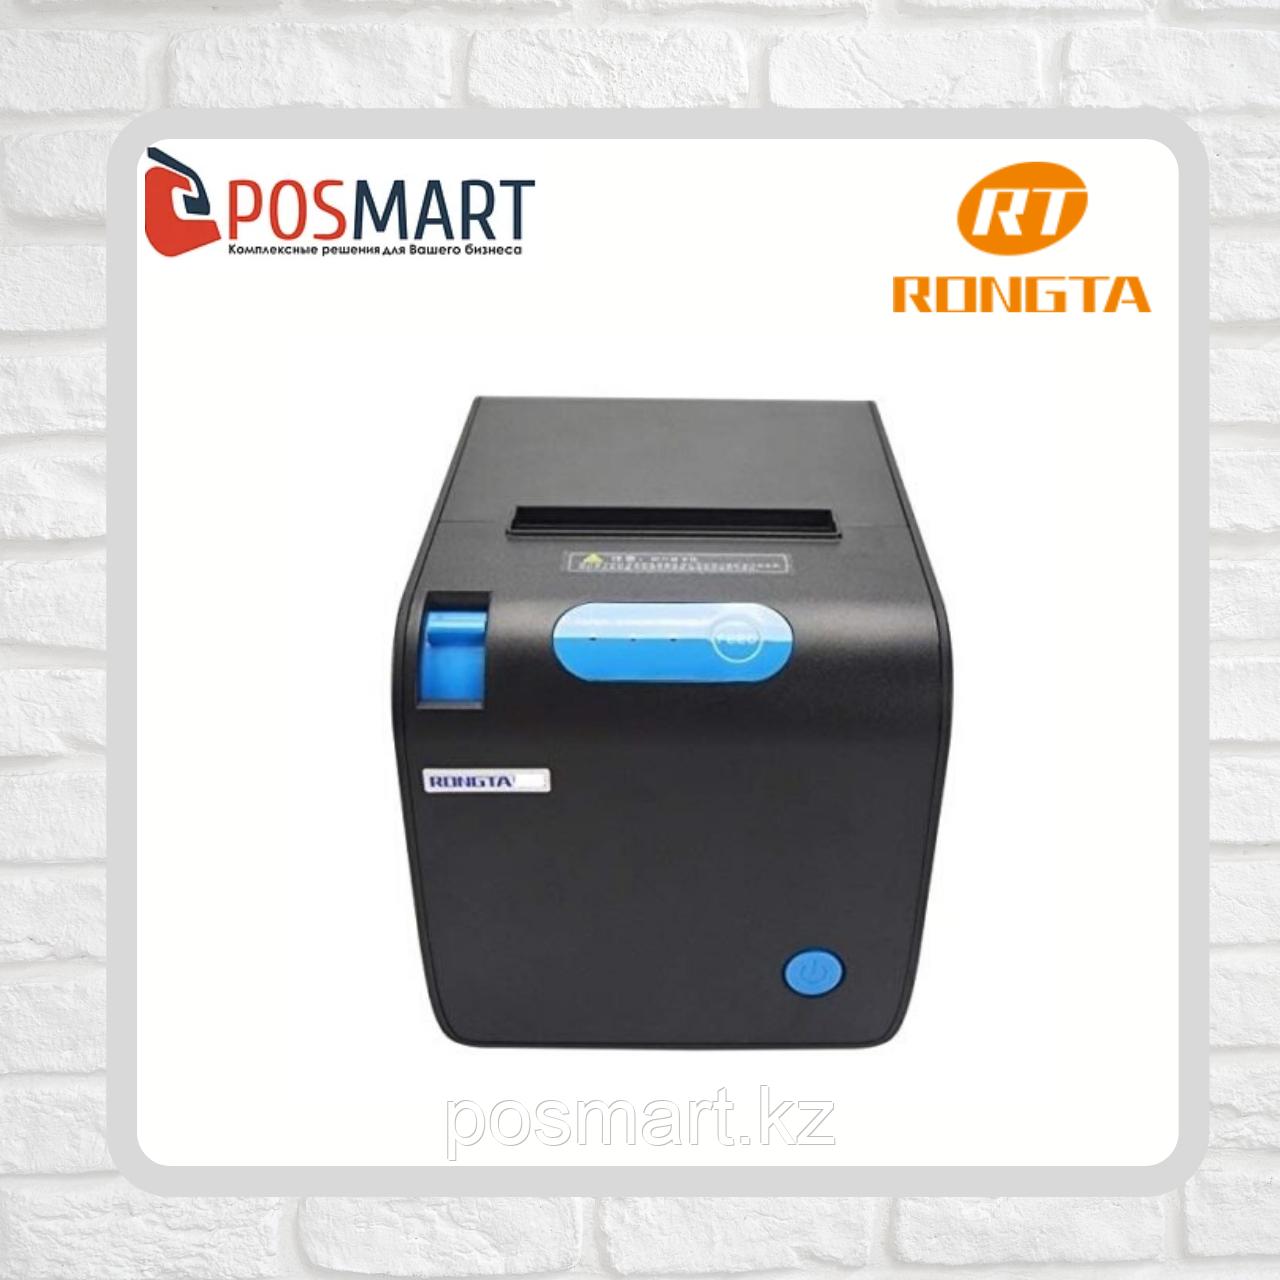 Чековый принтер Rongta RP328 USE